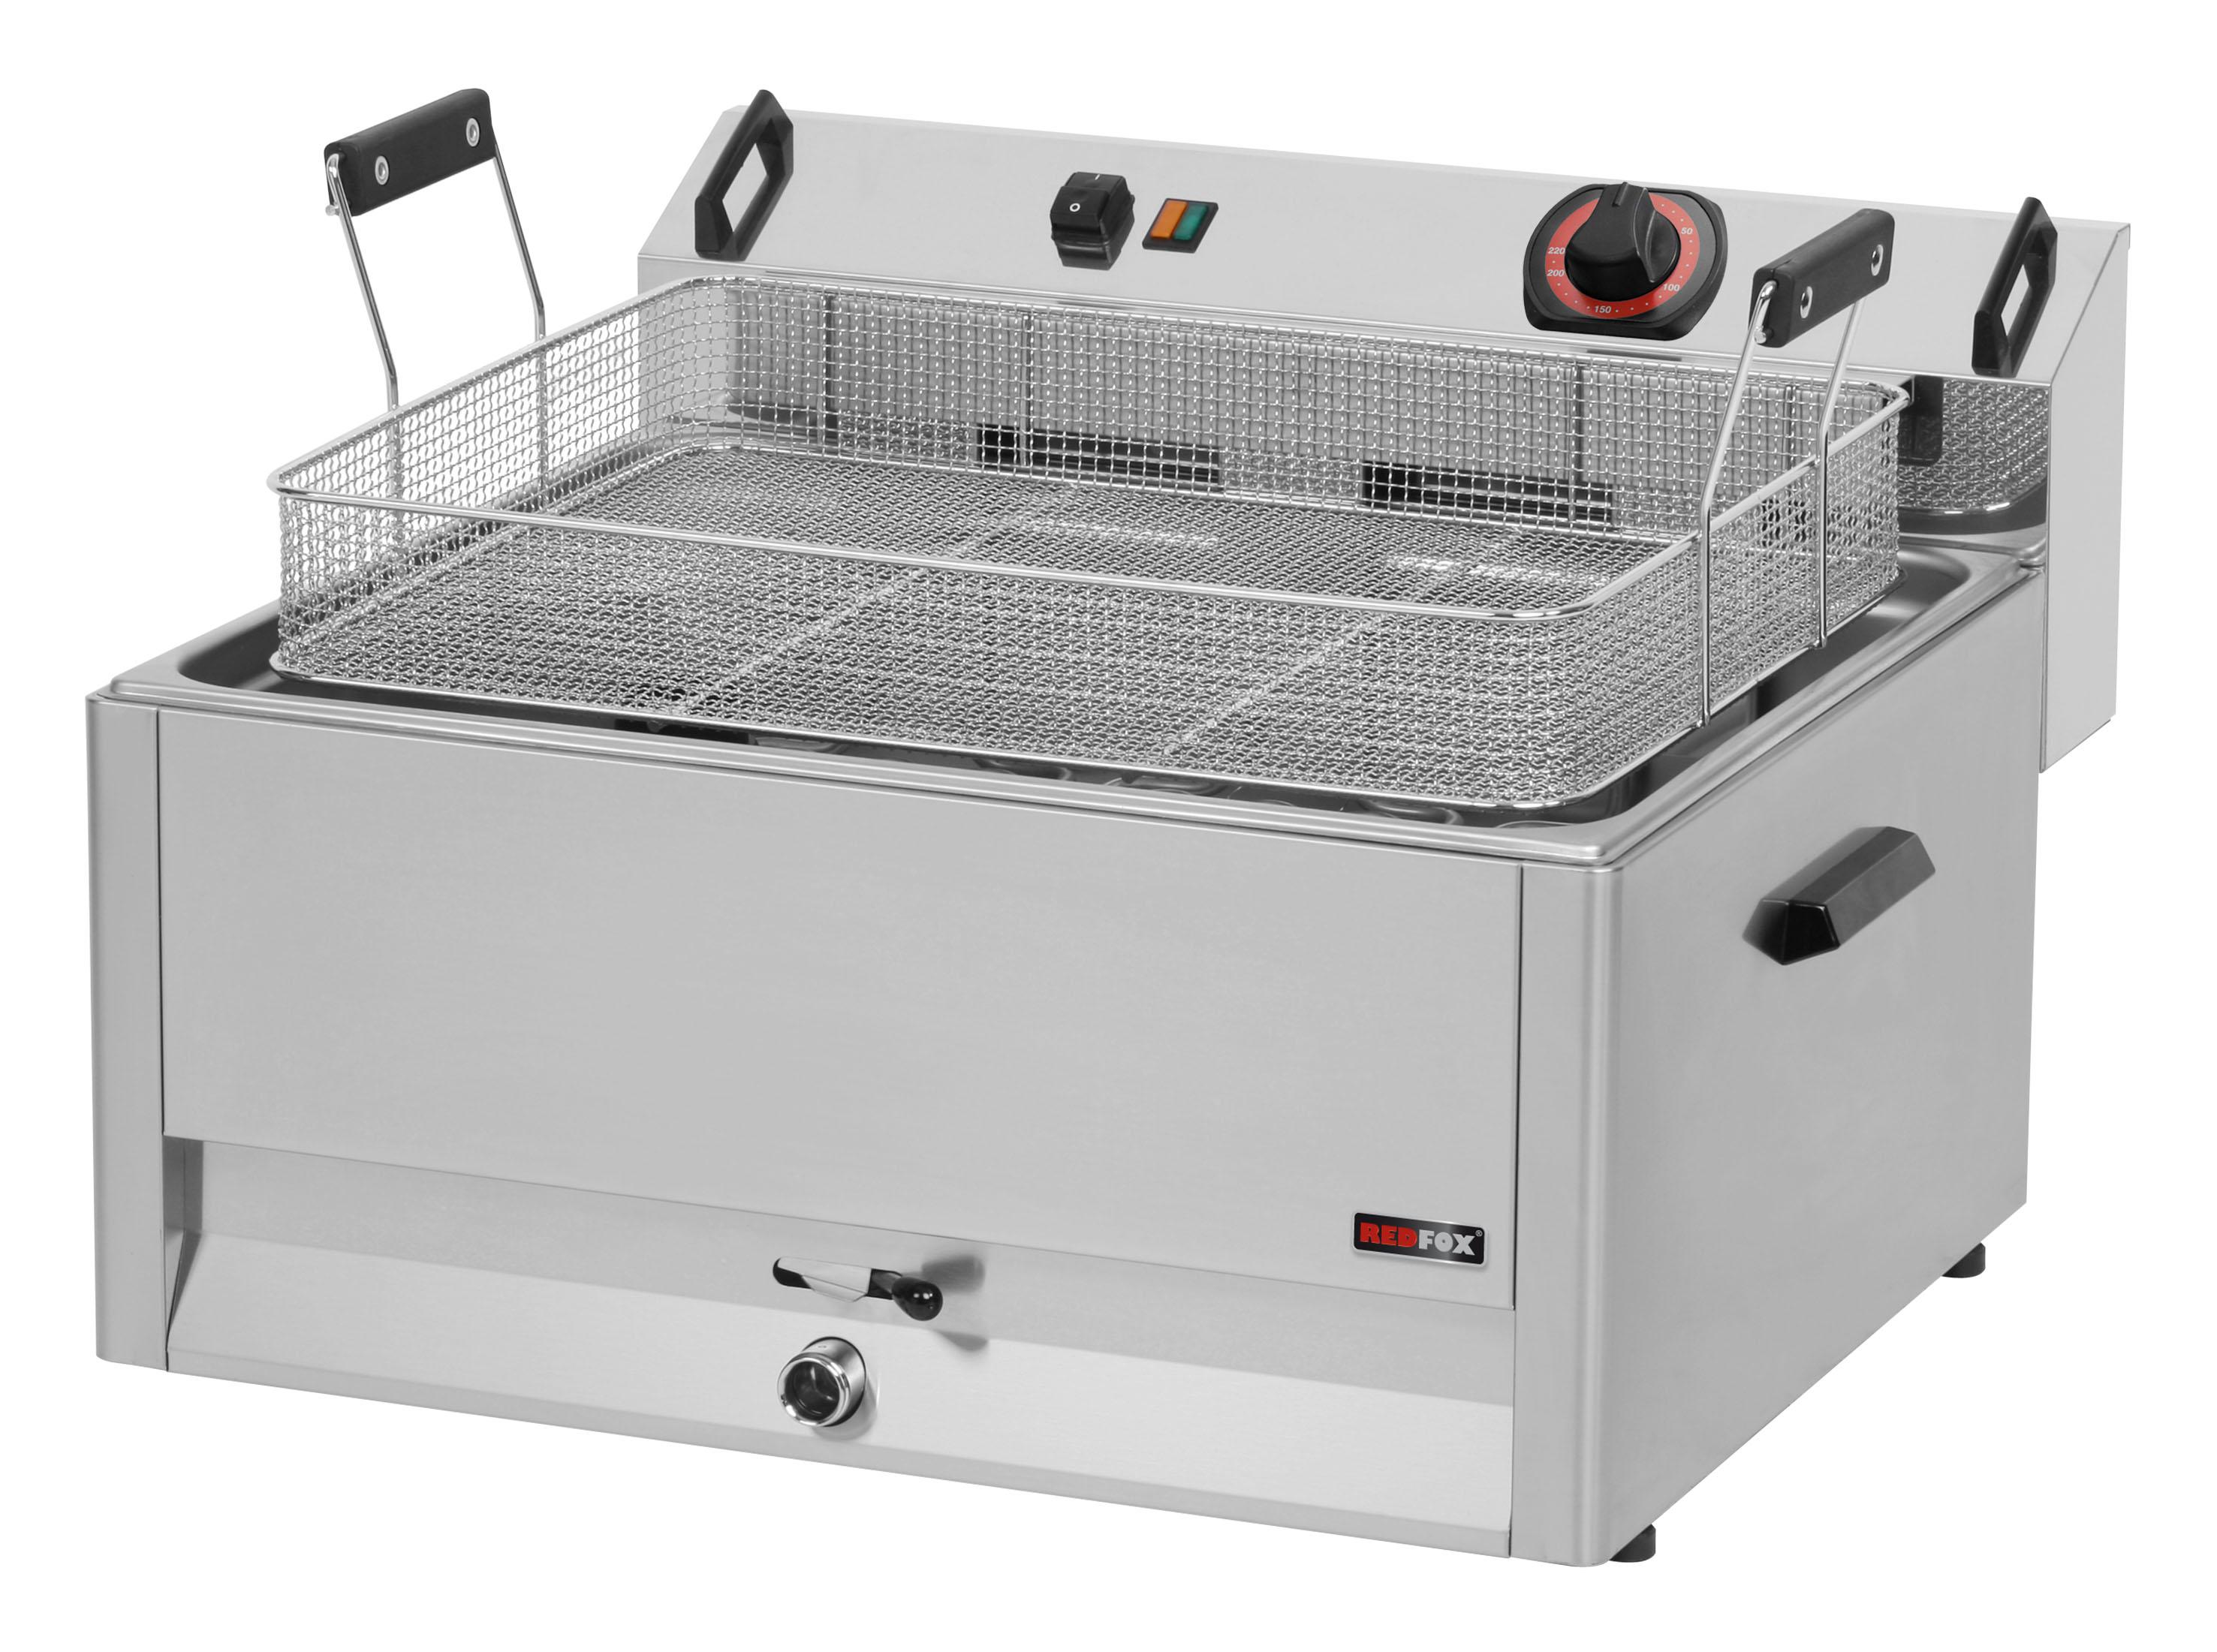 Fritéza elektrická 30 l FE 60 T třífázová REDFOX